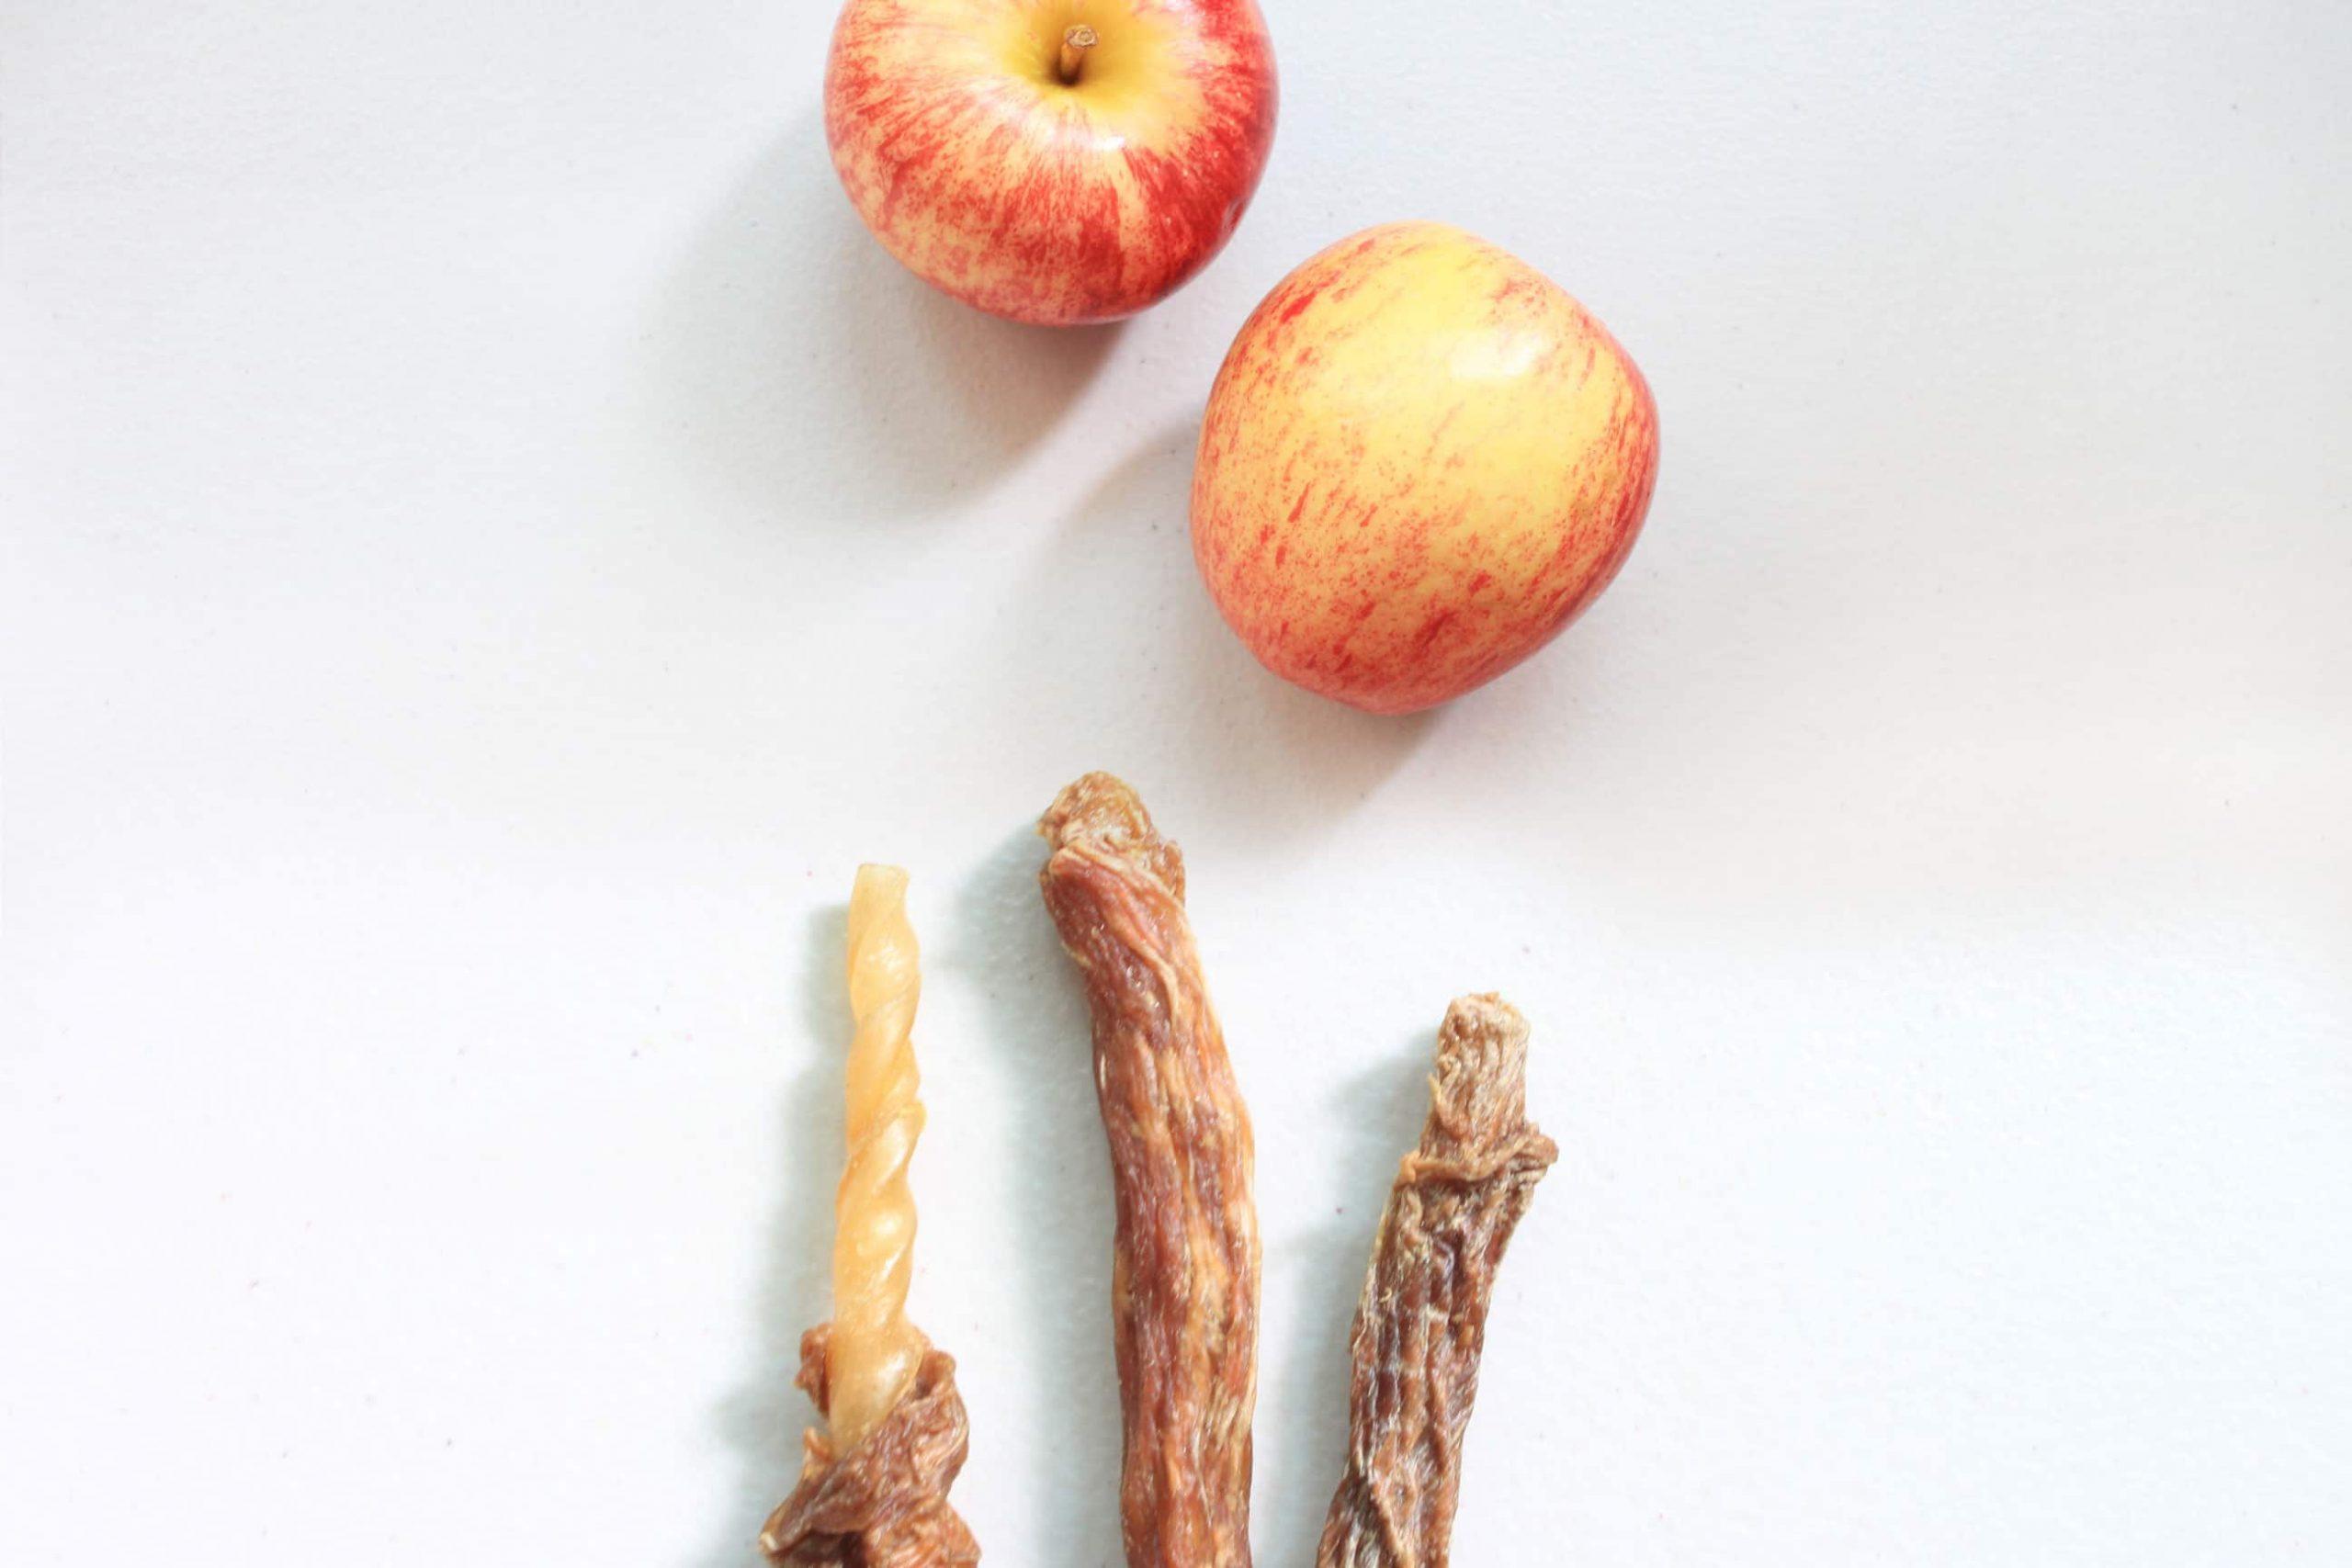 S6P2. 蘋果豬肉皮骨捲10支